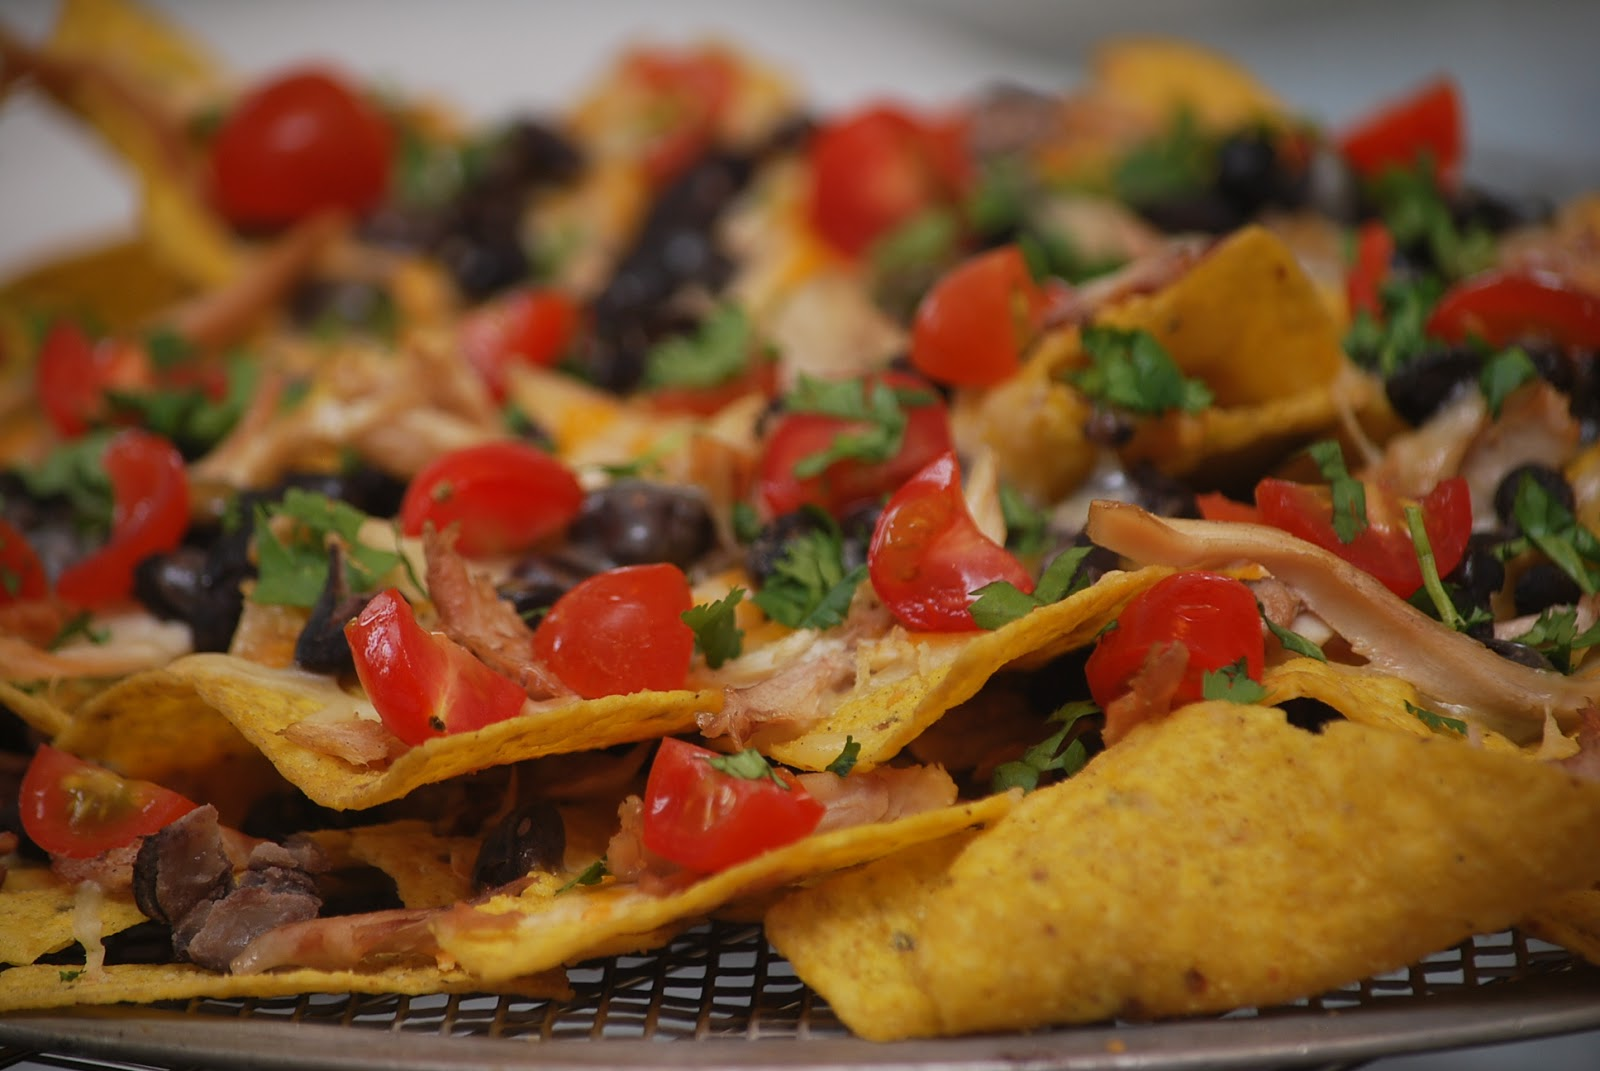 My story in recipes: Grilled Chicken Nachos